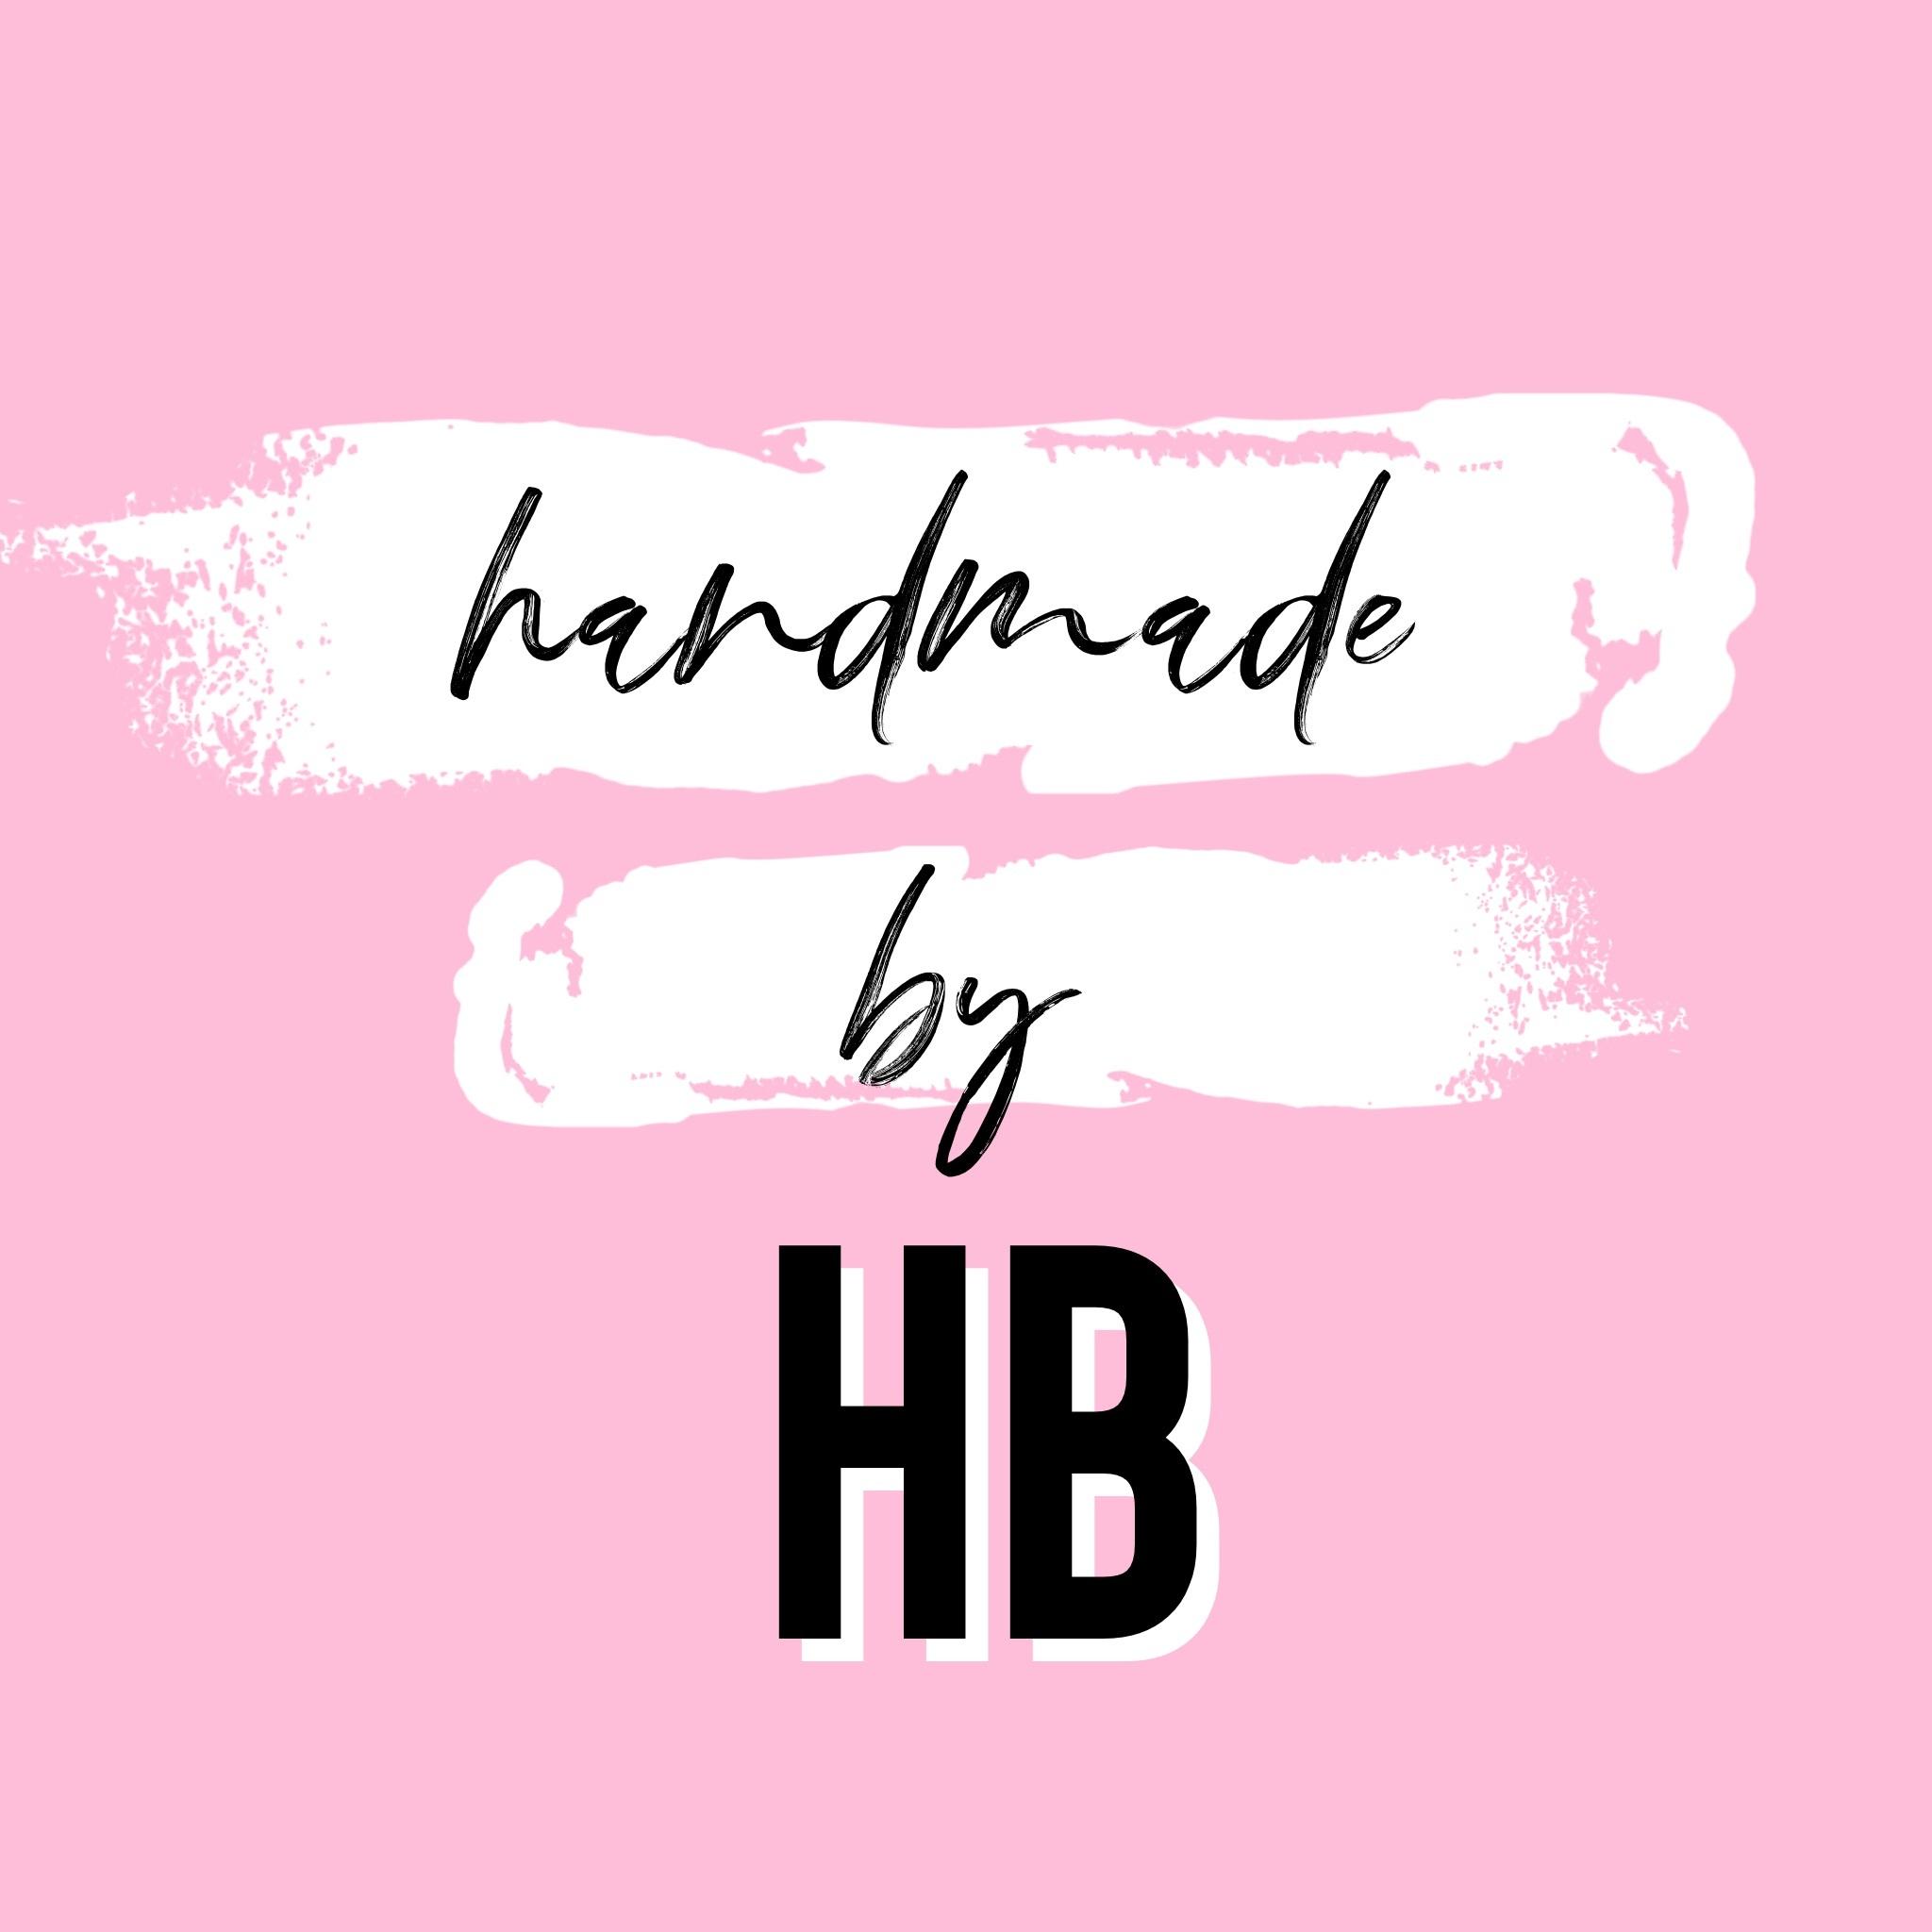 Handmade by HB